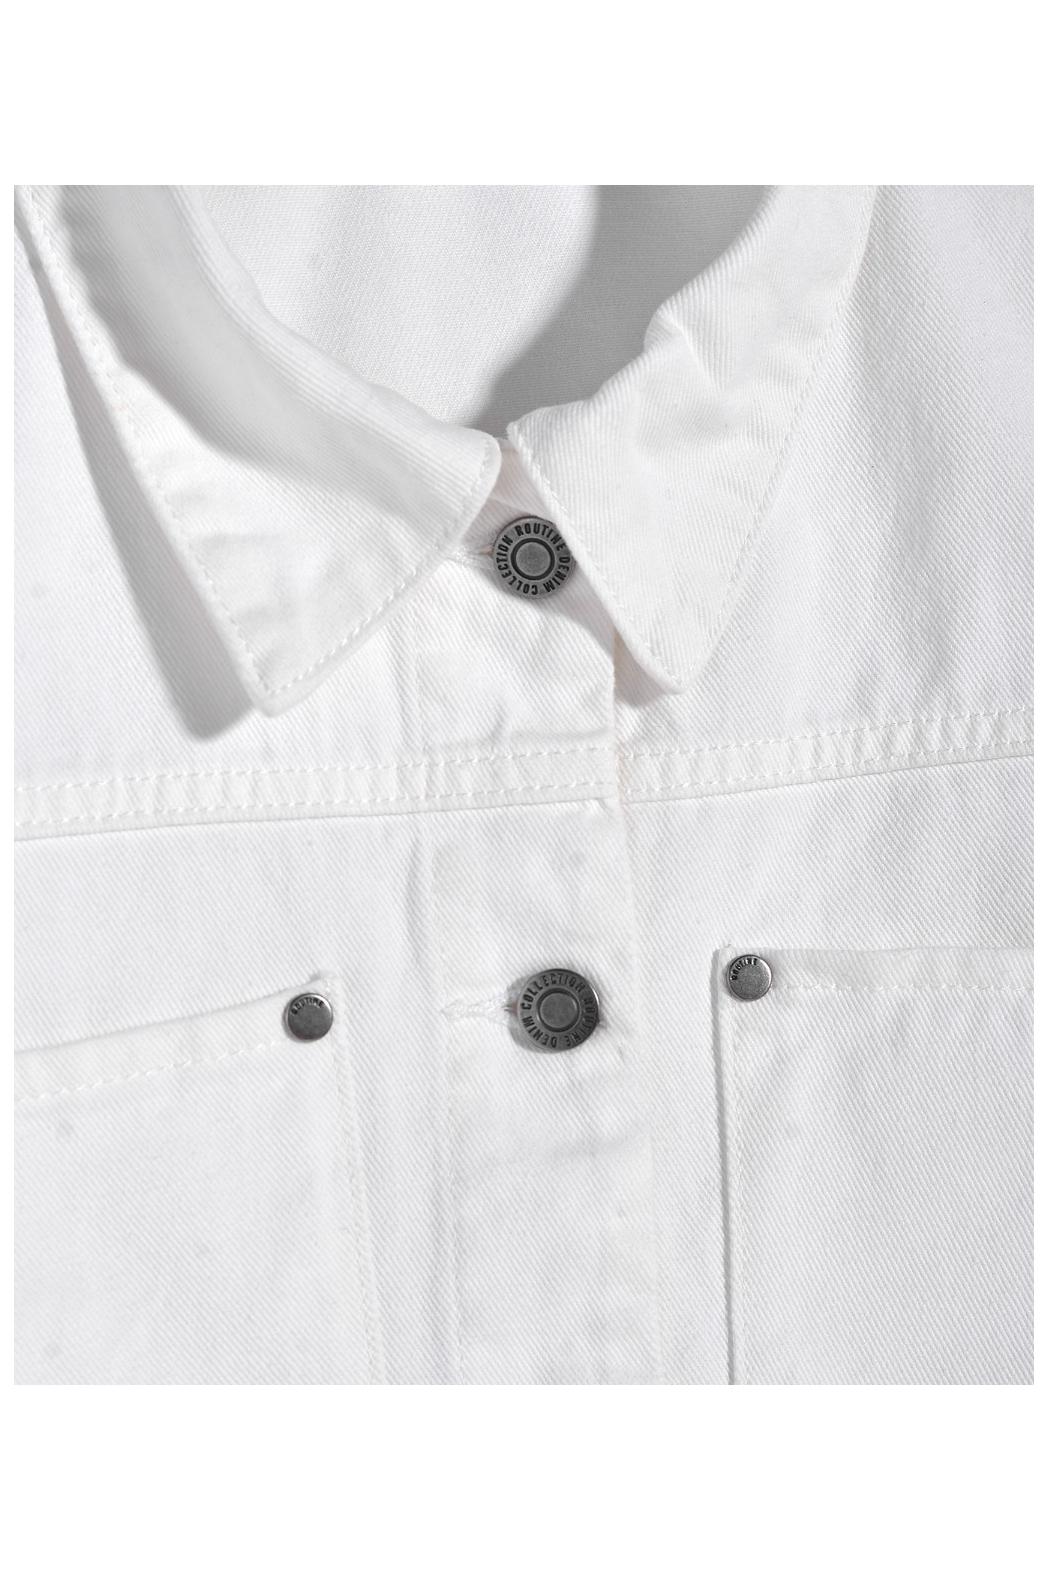 Áo khoác Jean nữ. Cotton - 10F20DJAW003